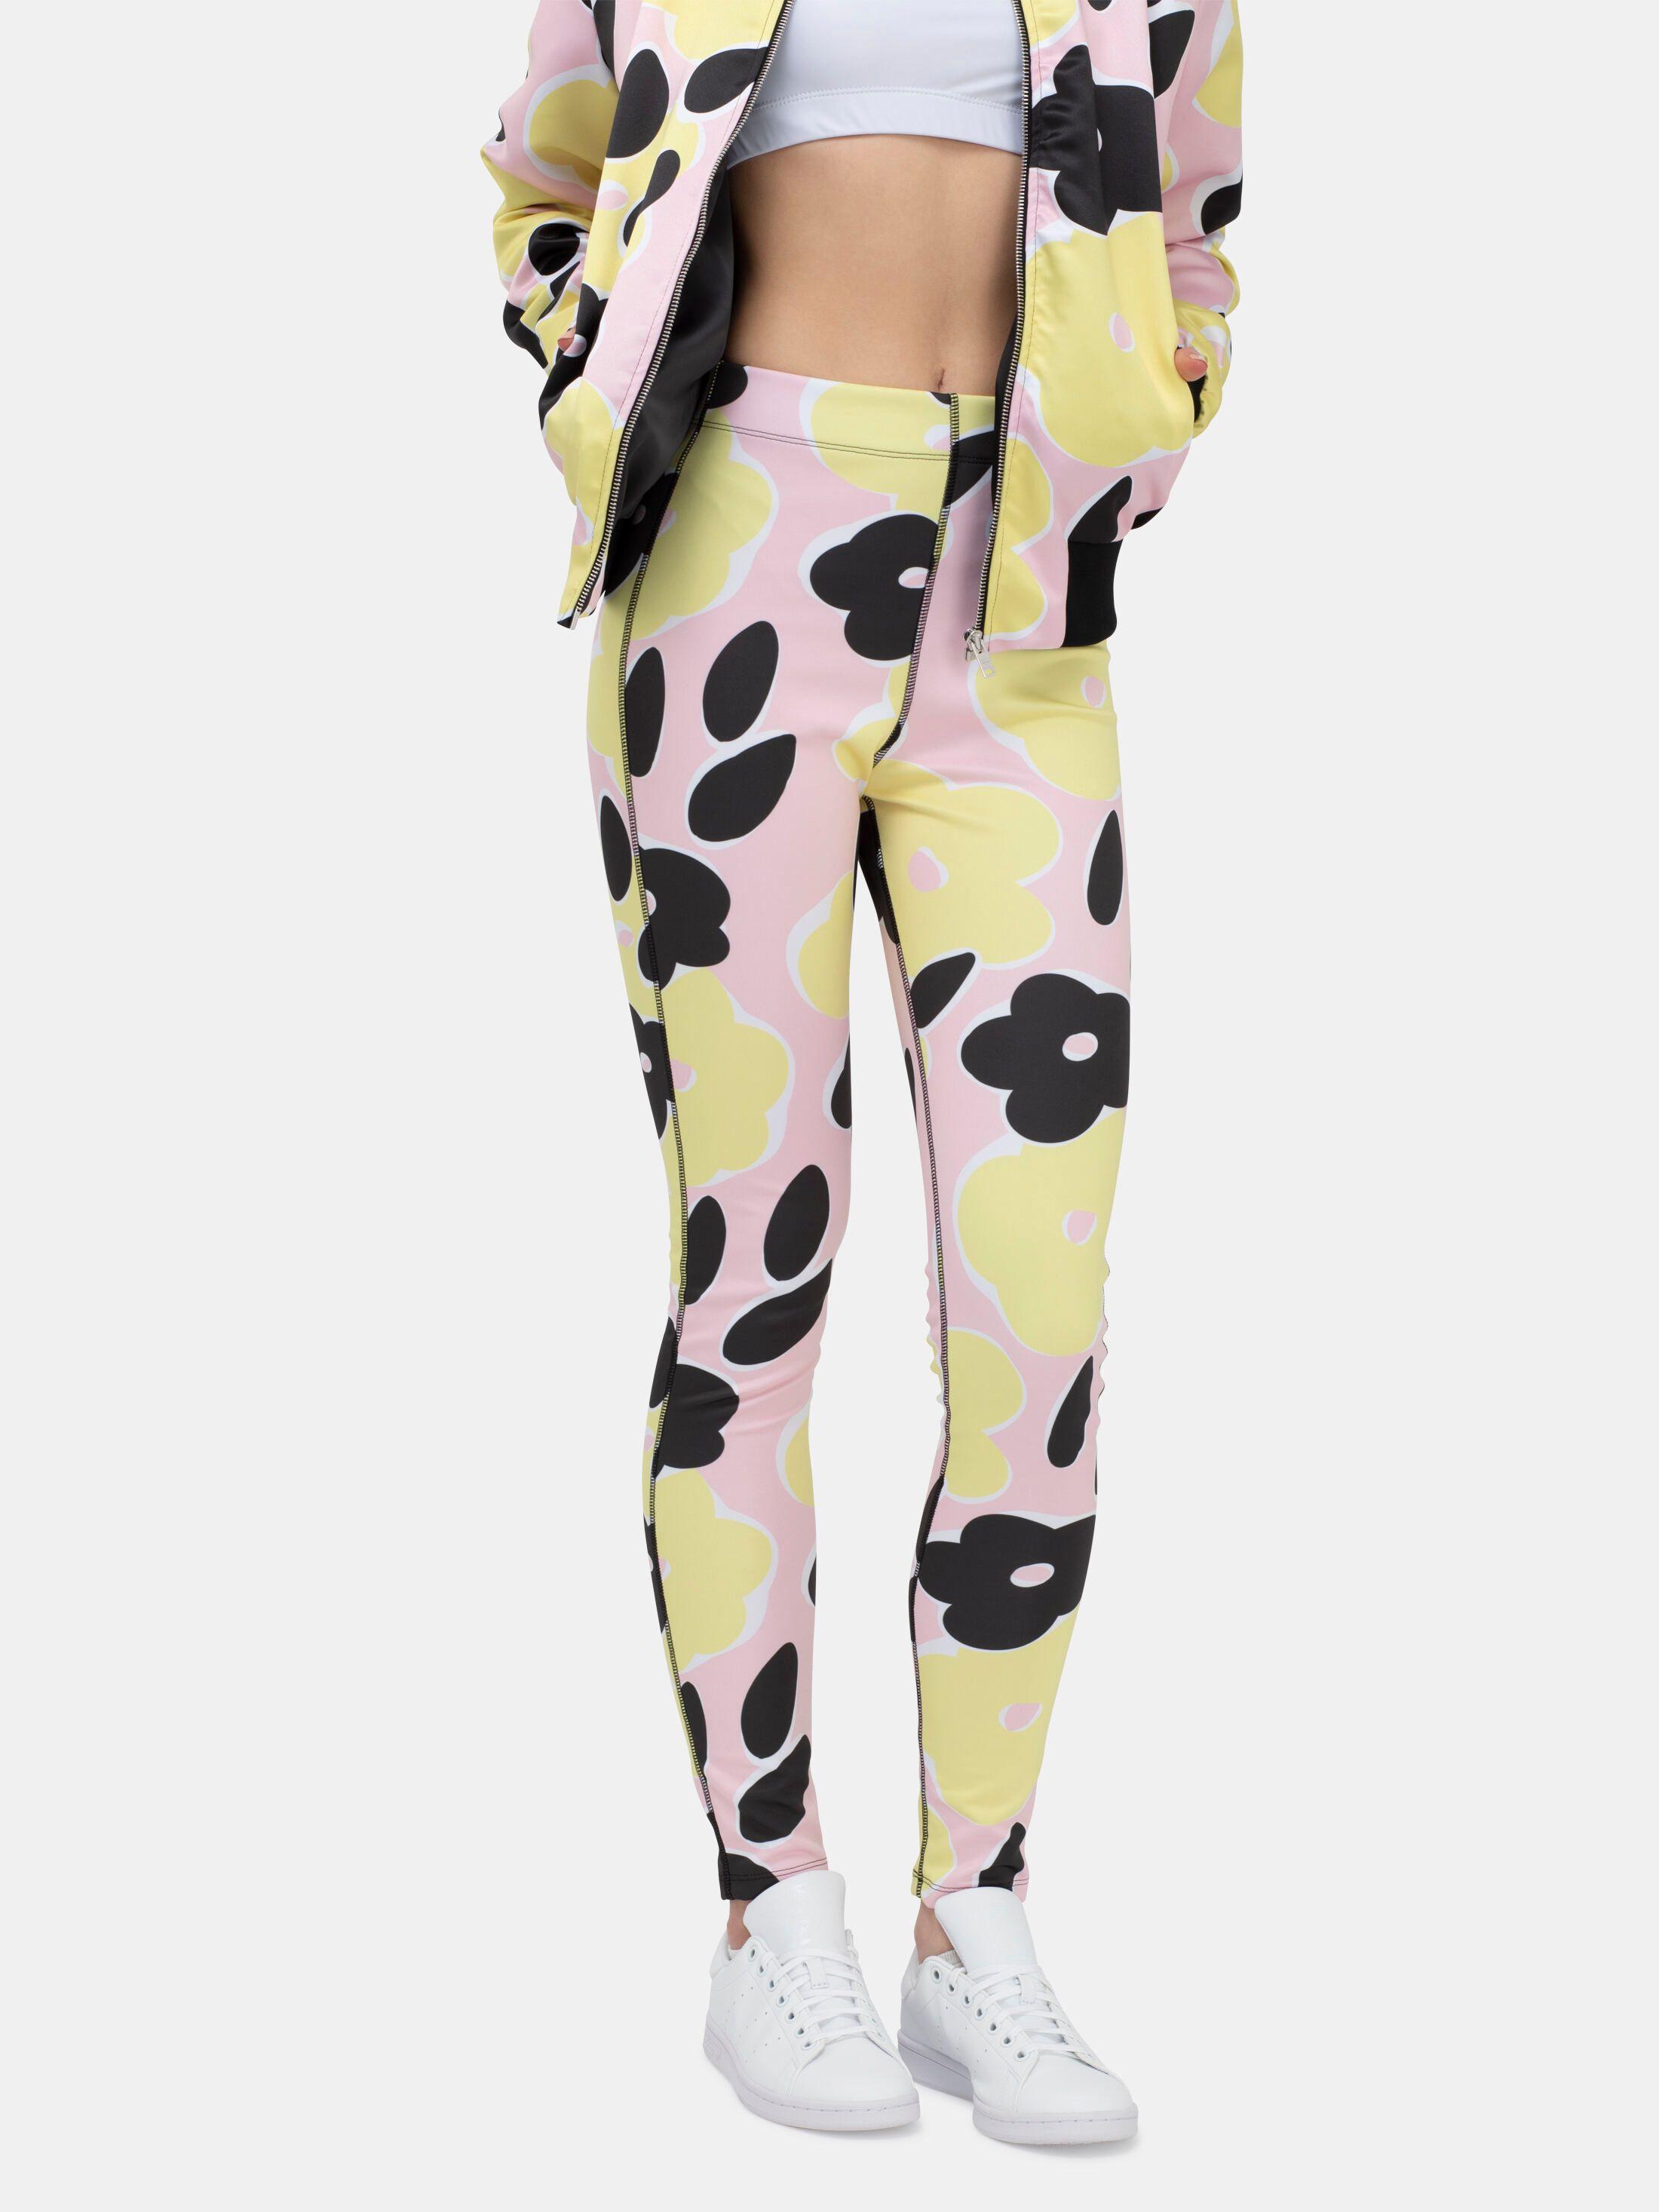 Printed personalized Cindy legging design